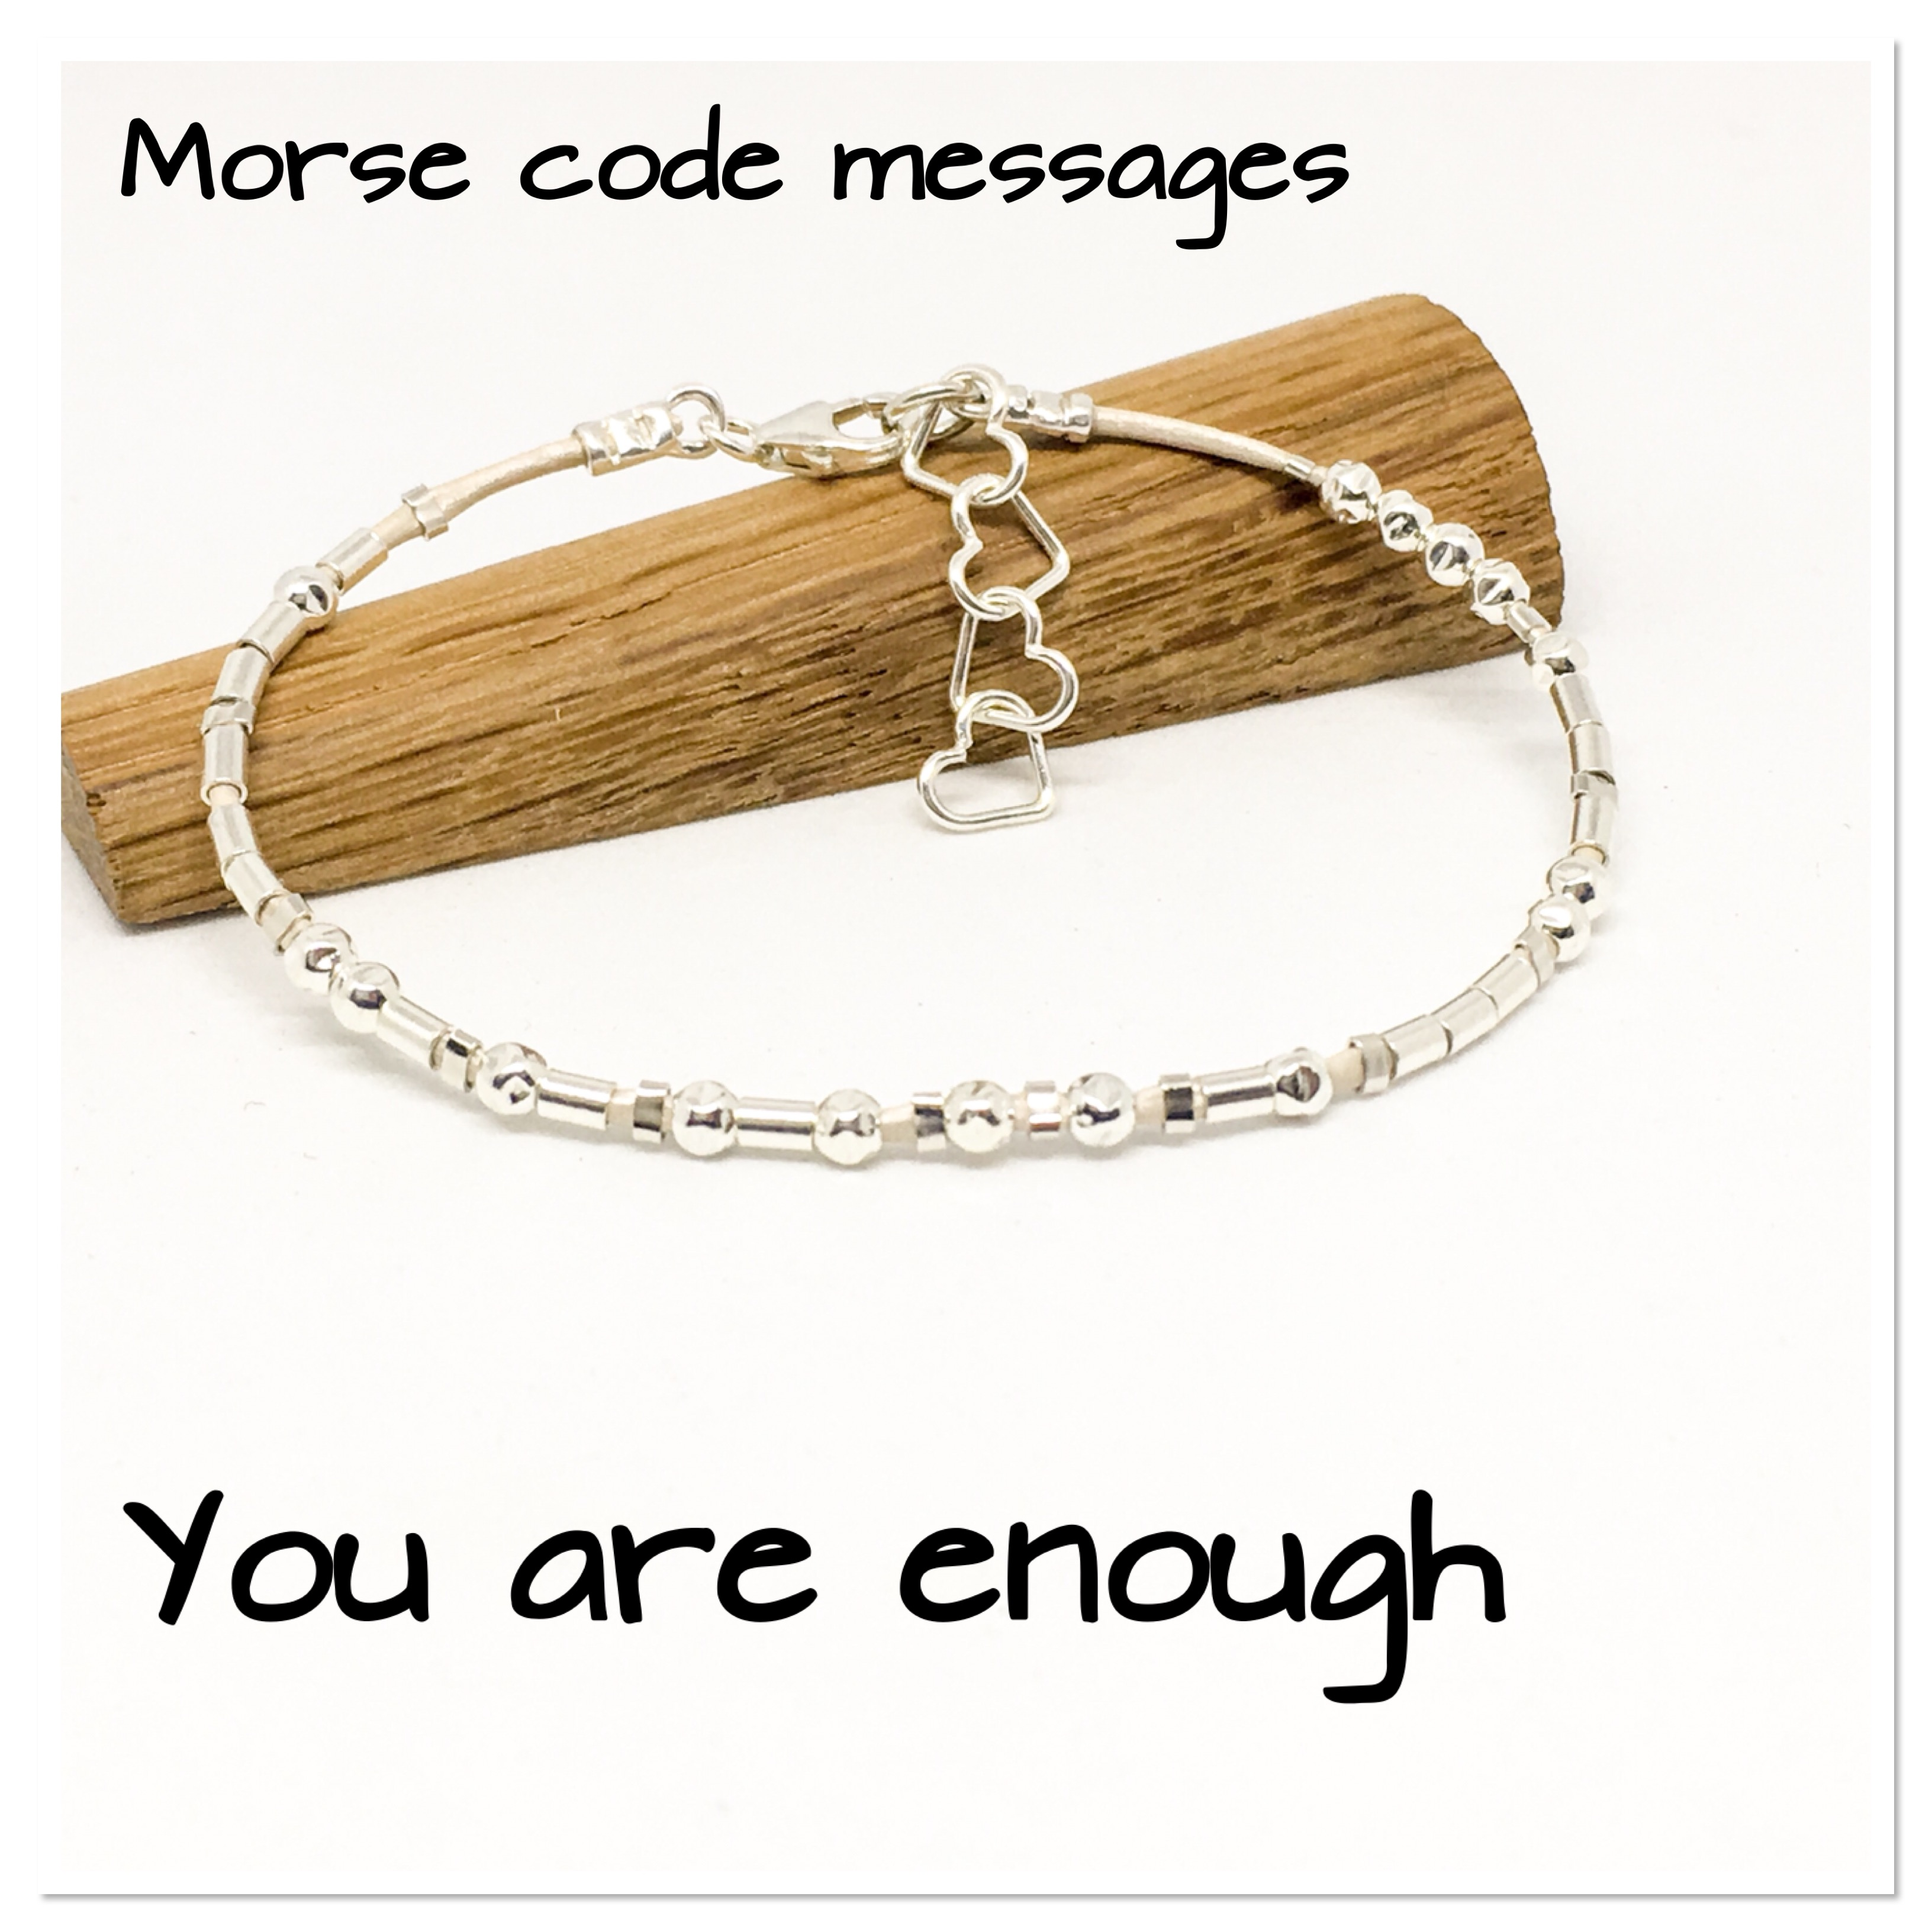 5ec74fe548522 You are enough Morse code bracelet, hidden message bracelet, sterling  silver and leather